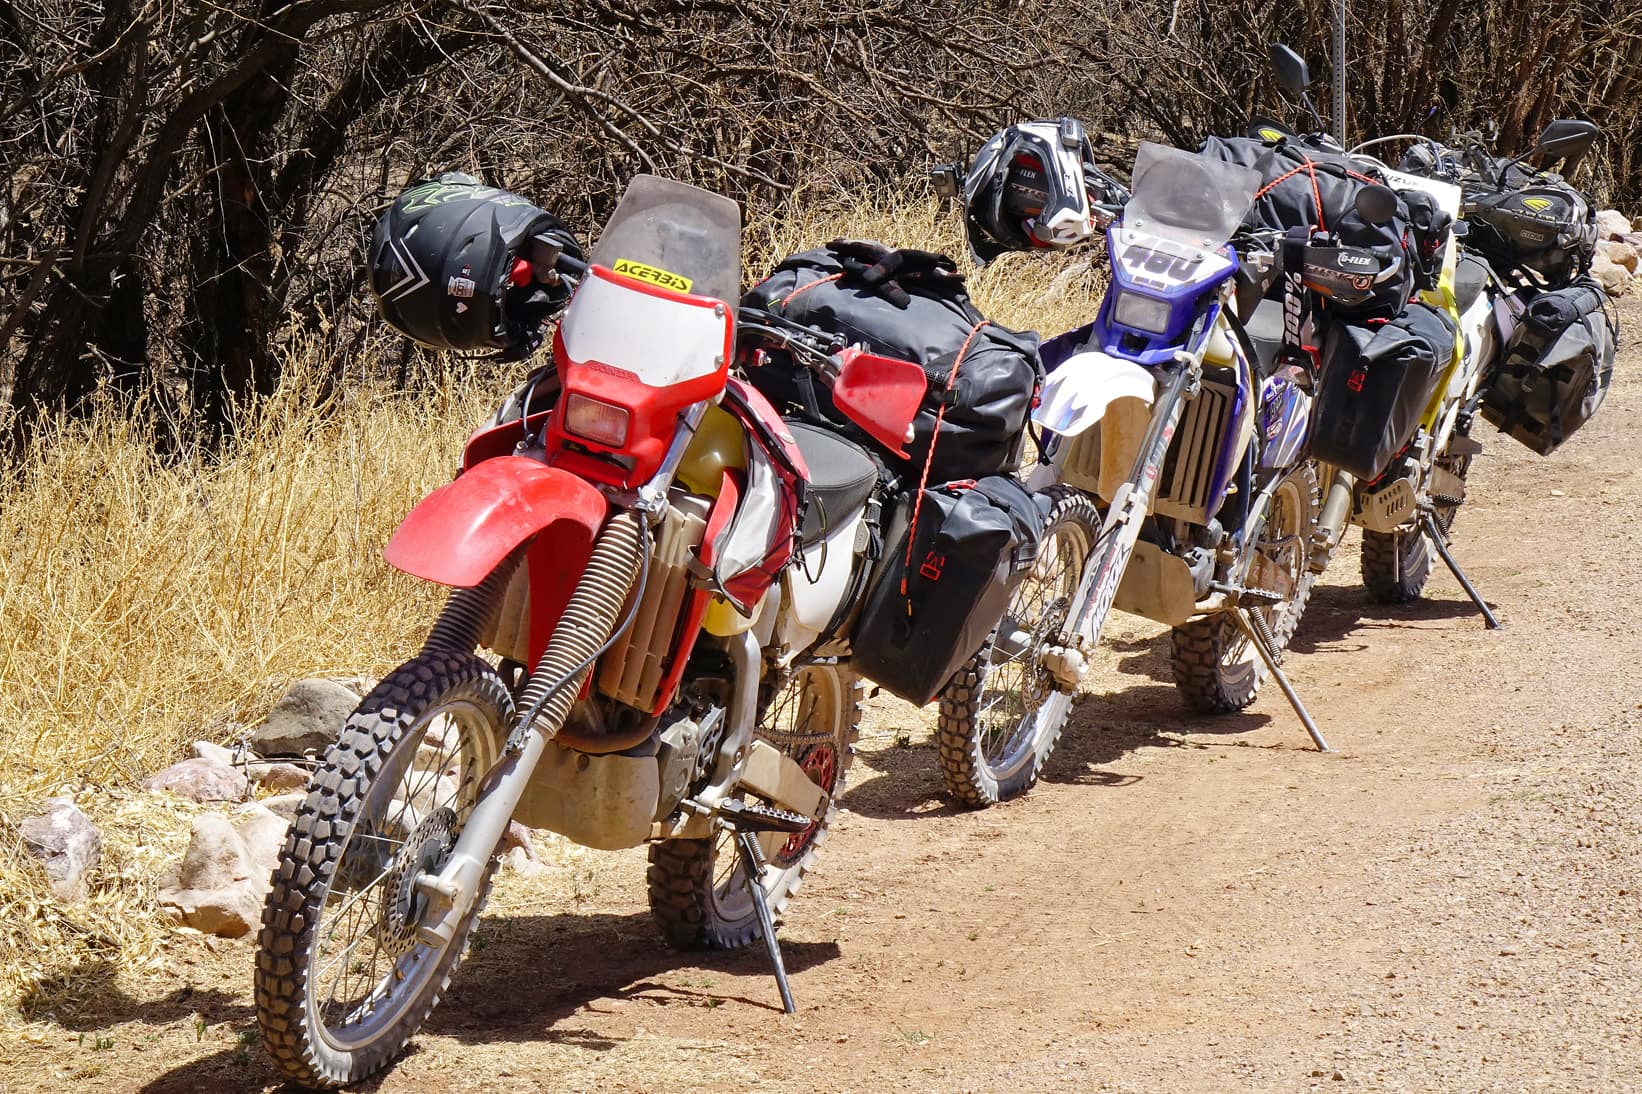 Southern AZ Motorcycle